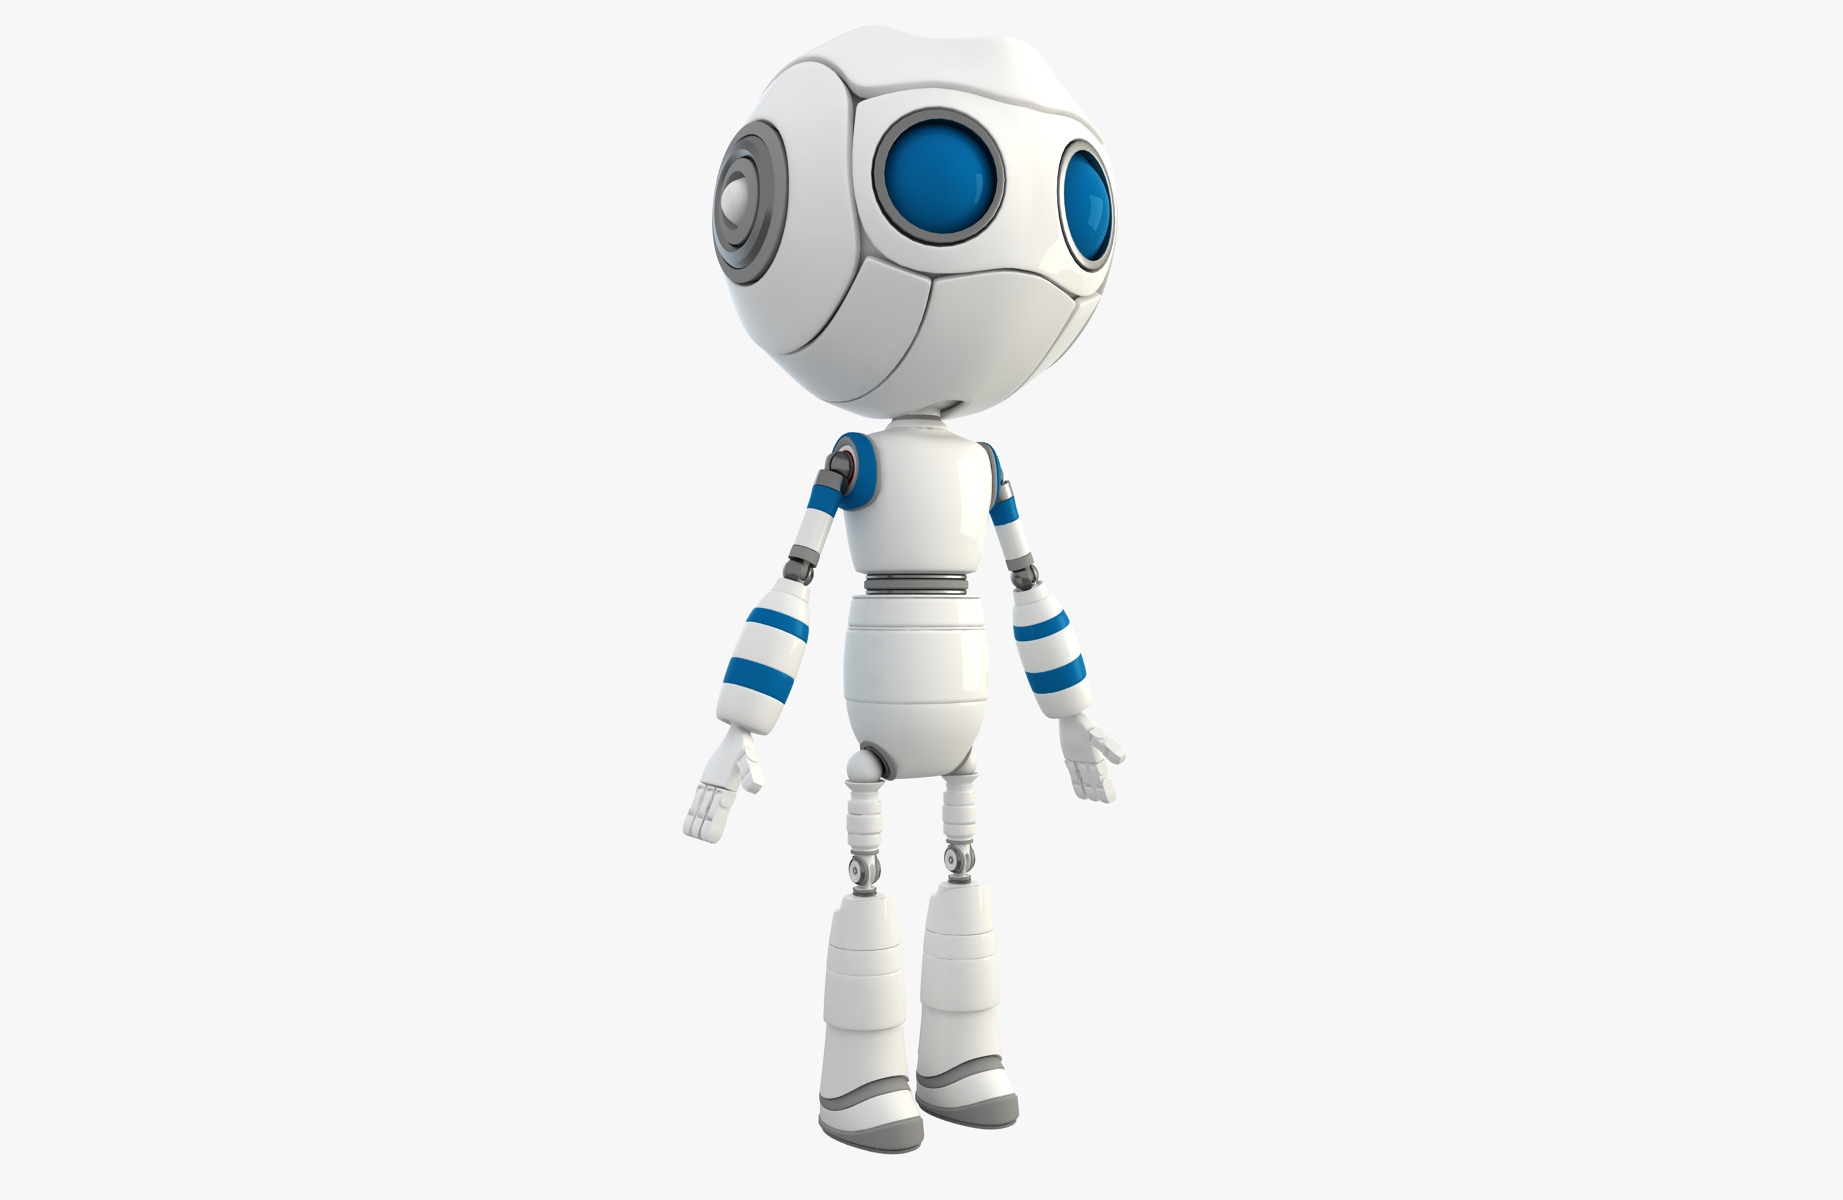 New Robot Character